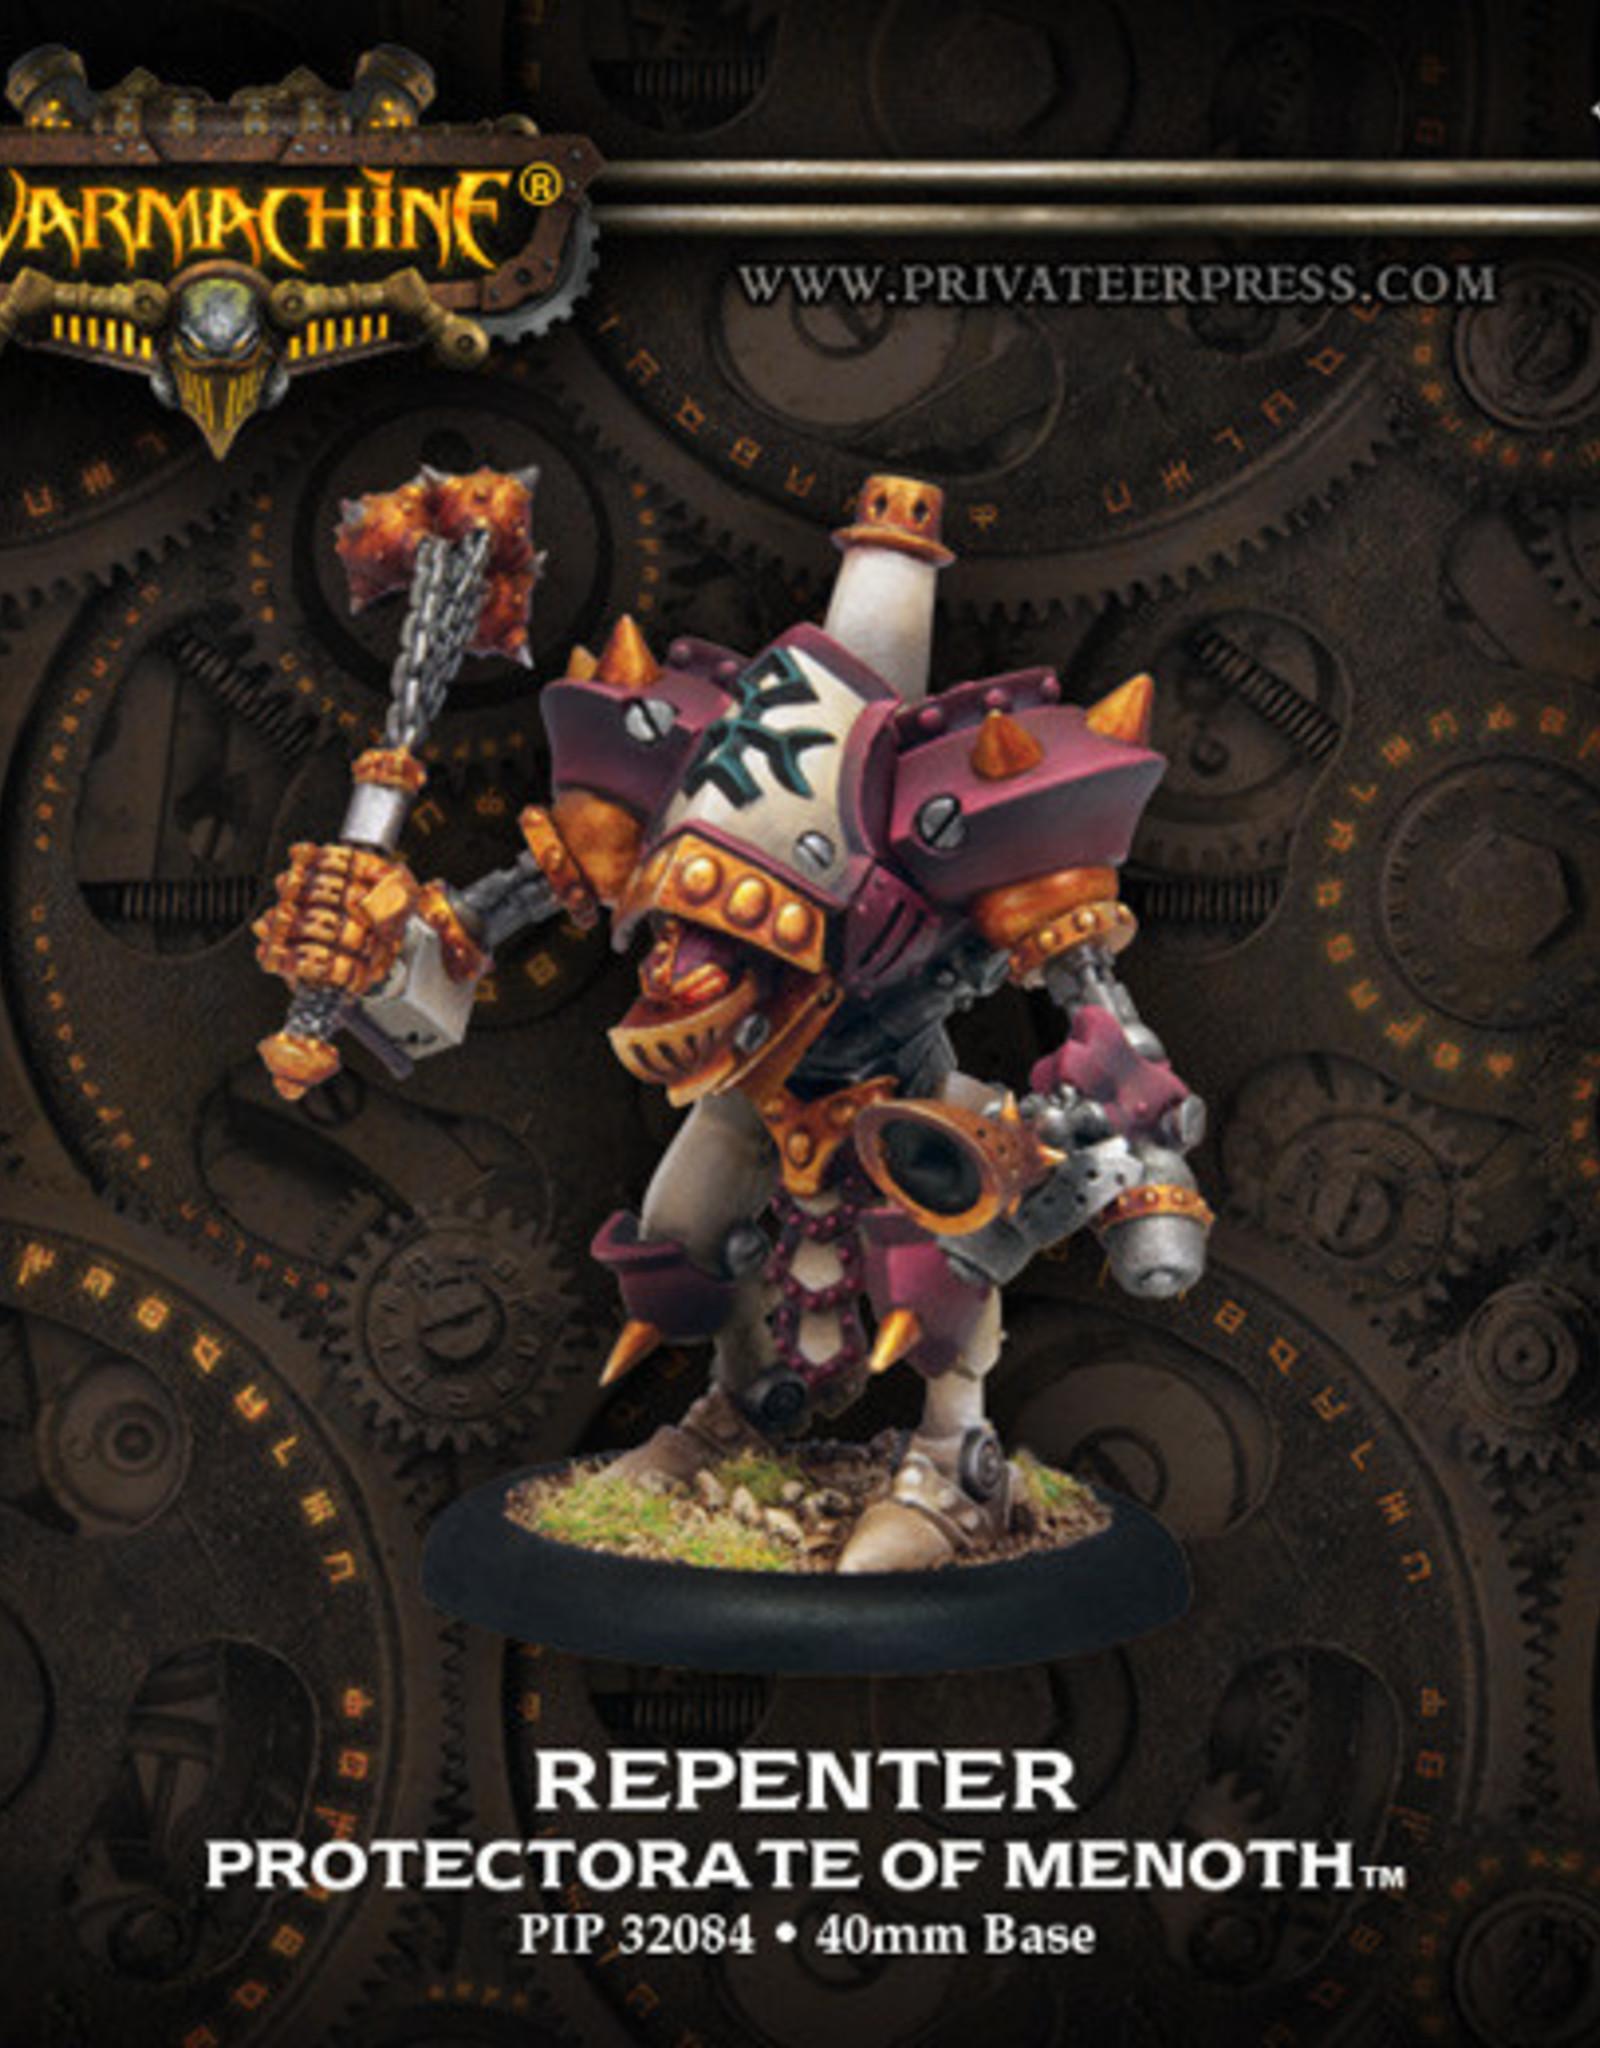 Warmachine Protectorate - Repenter